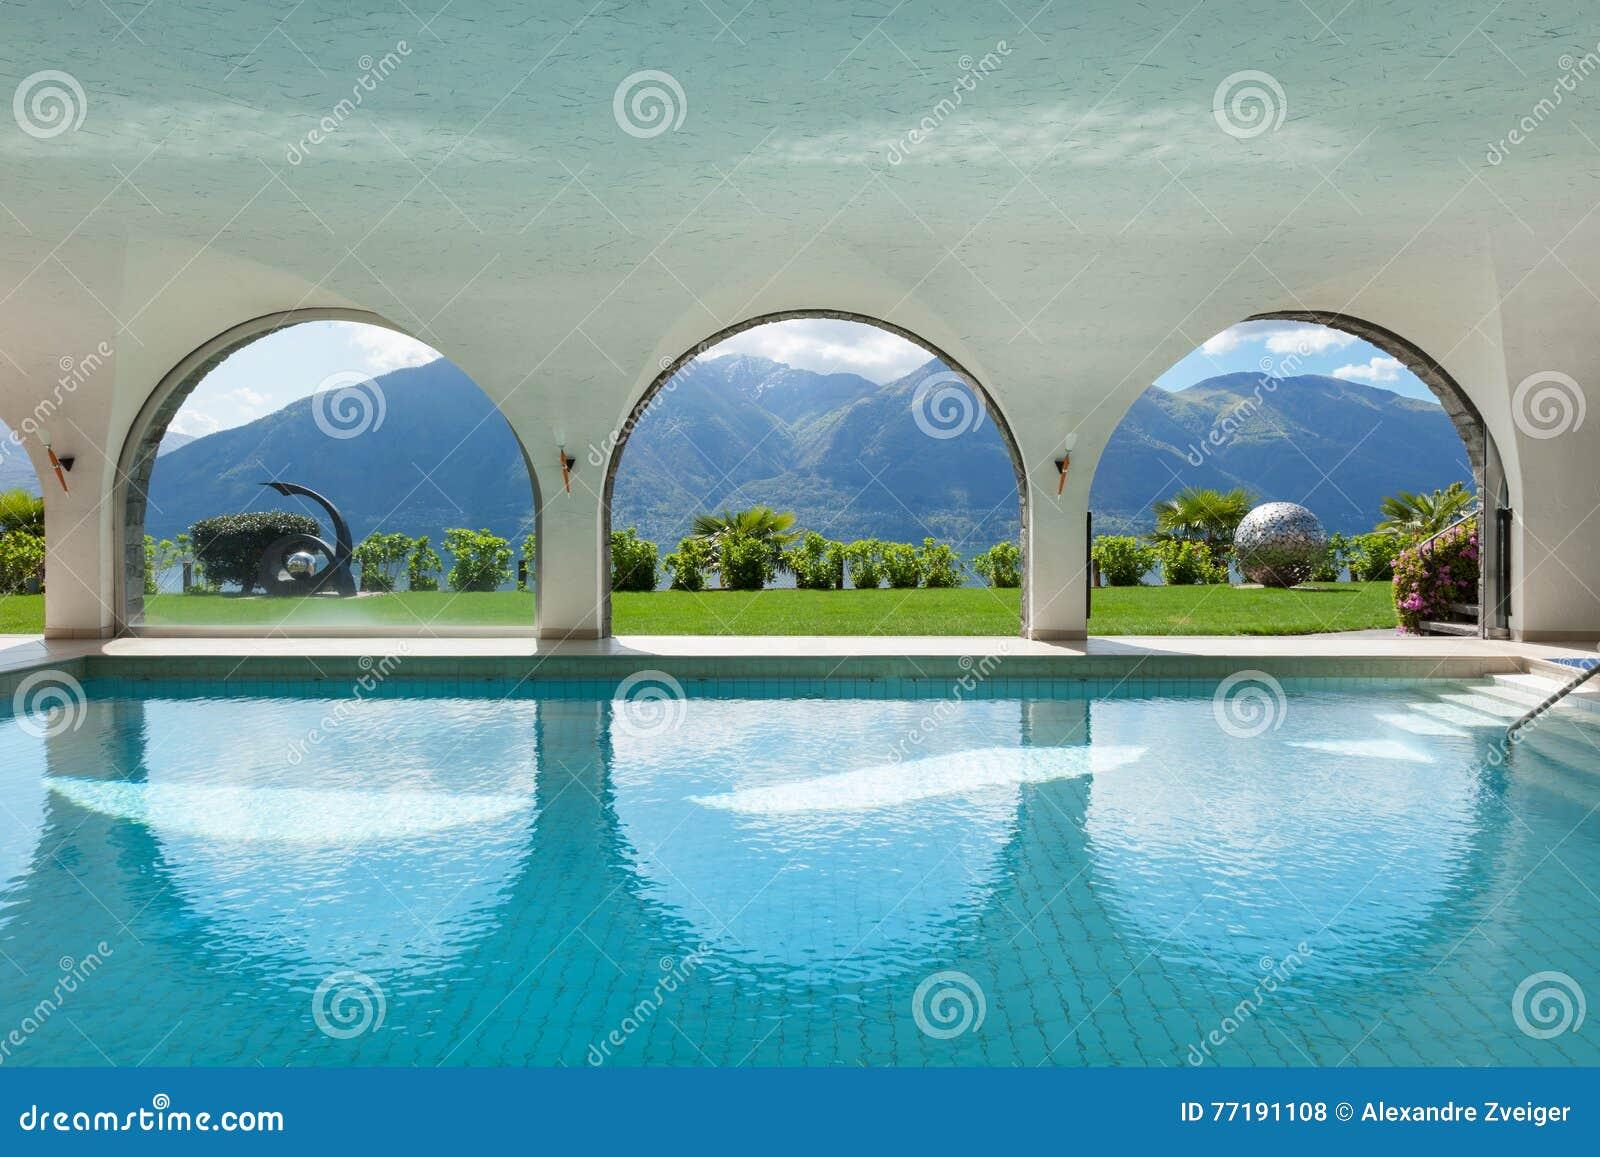 Swimmingpool eines Landhauses, Innen